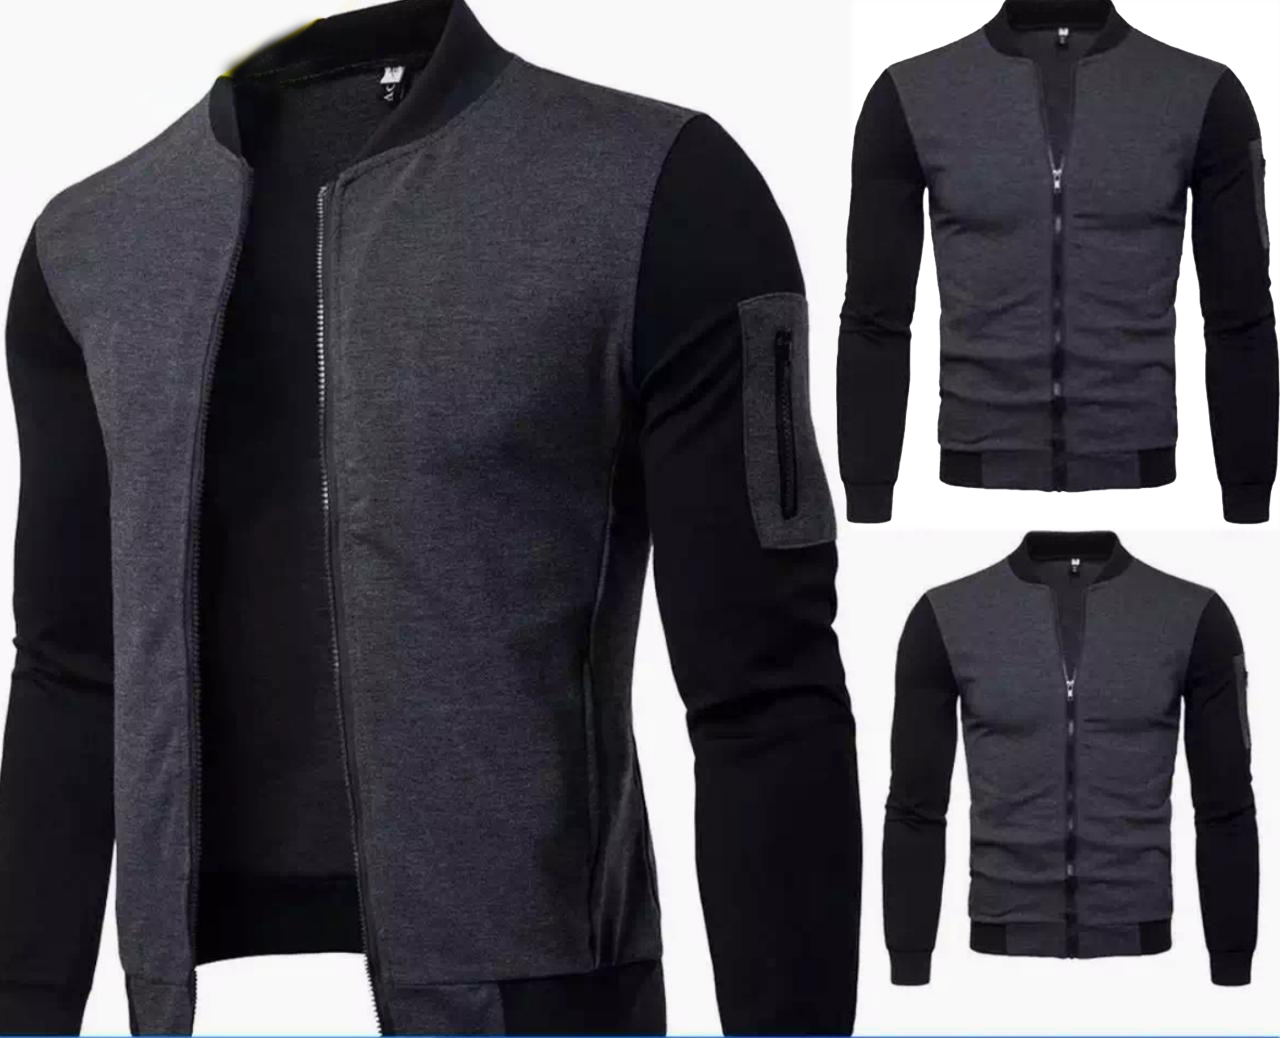 Stylish Charcoal Zipper Jacket